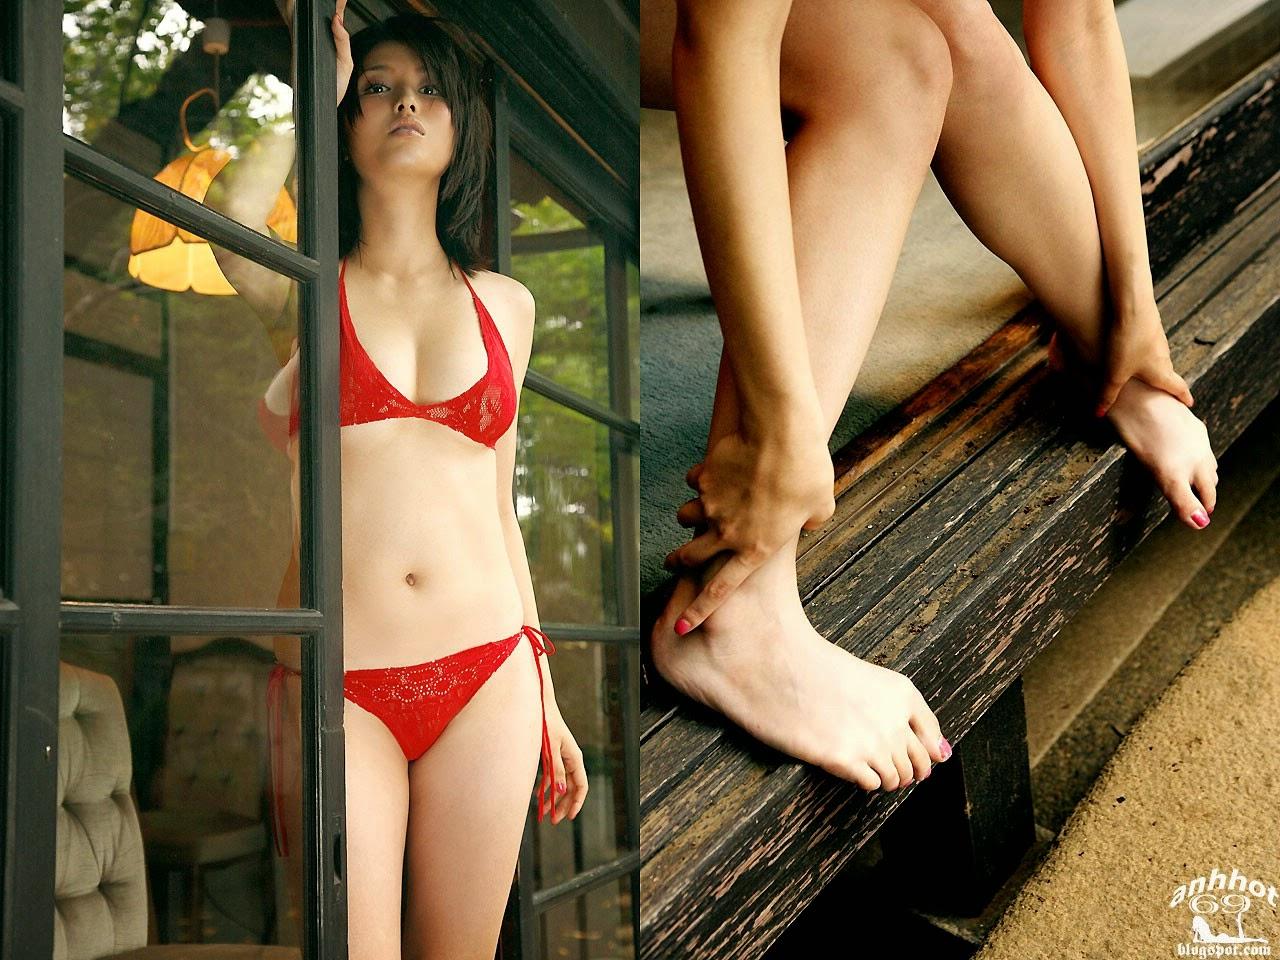 manami-hashimoto-01989728